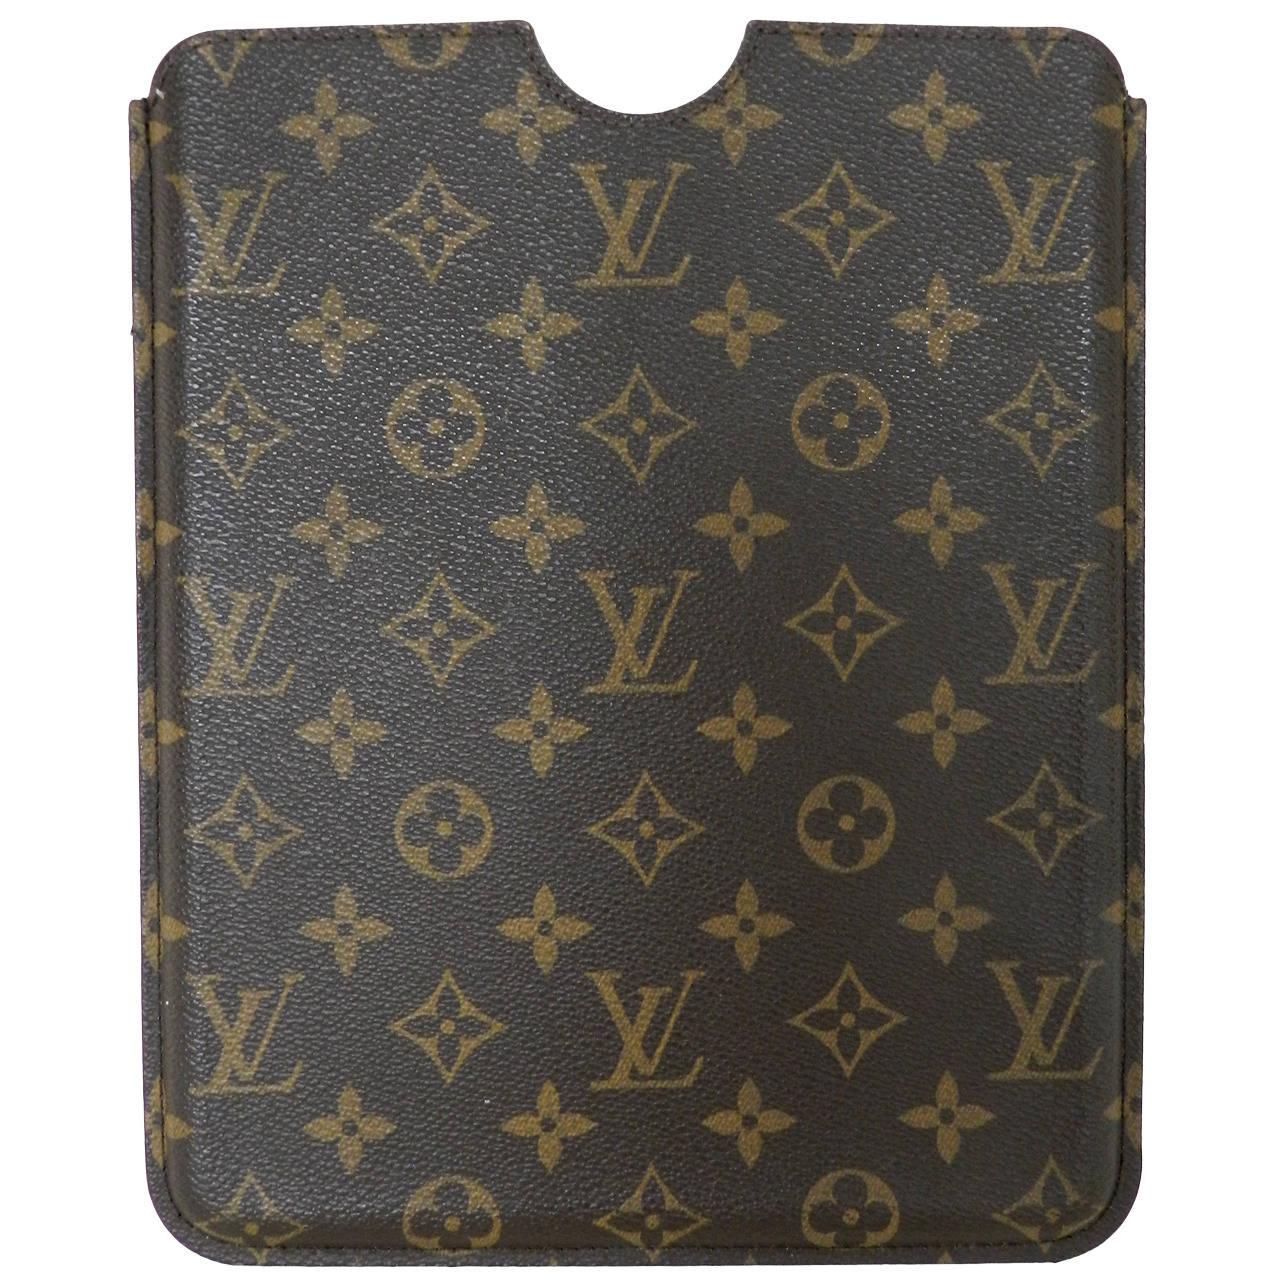 3bbc7cee0a5e Louis Vuitton Monogram Ipad Hard Case at 1stdibs